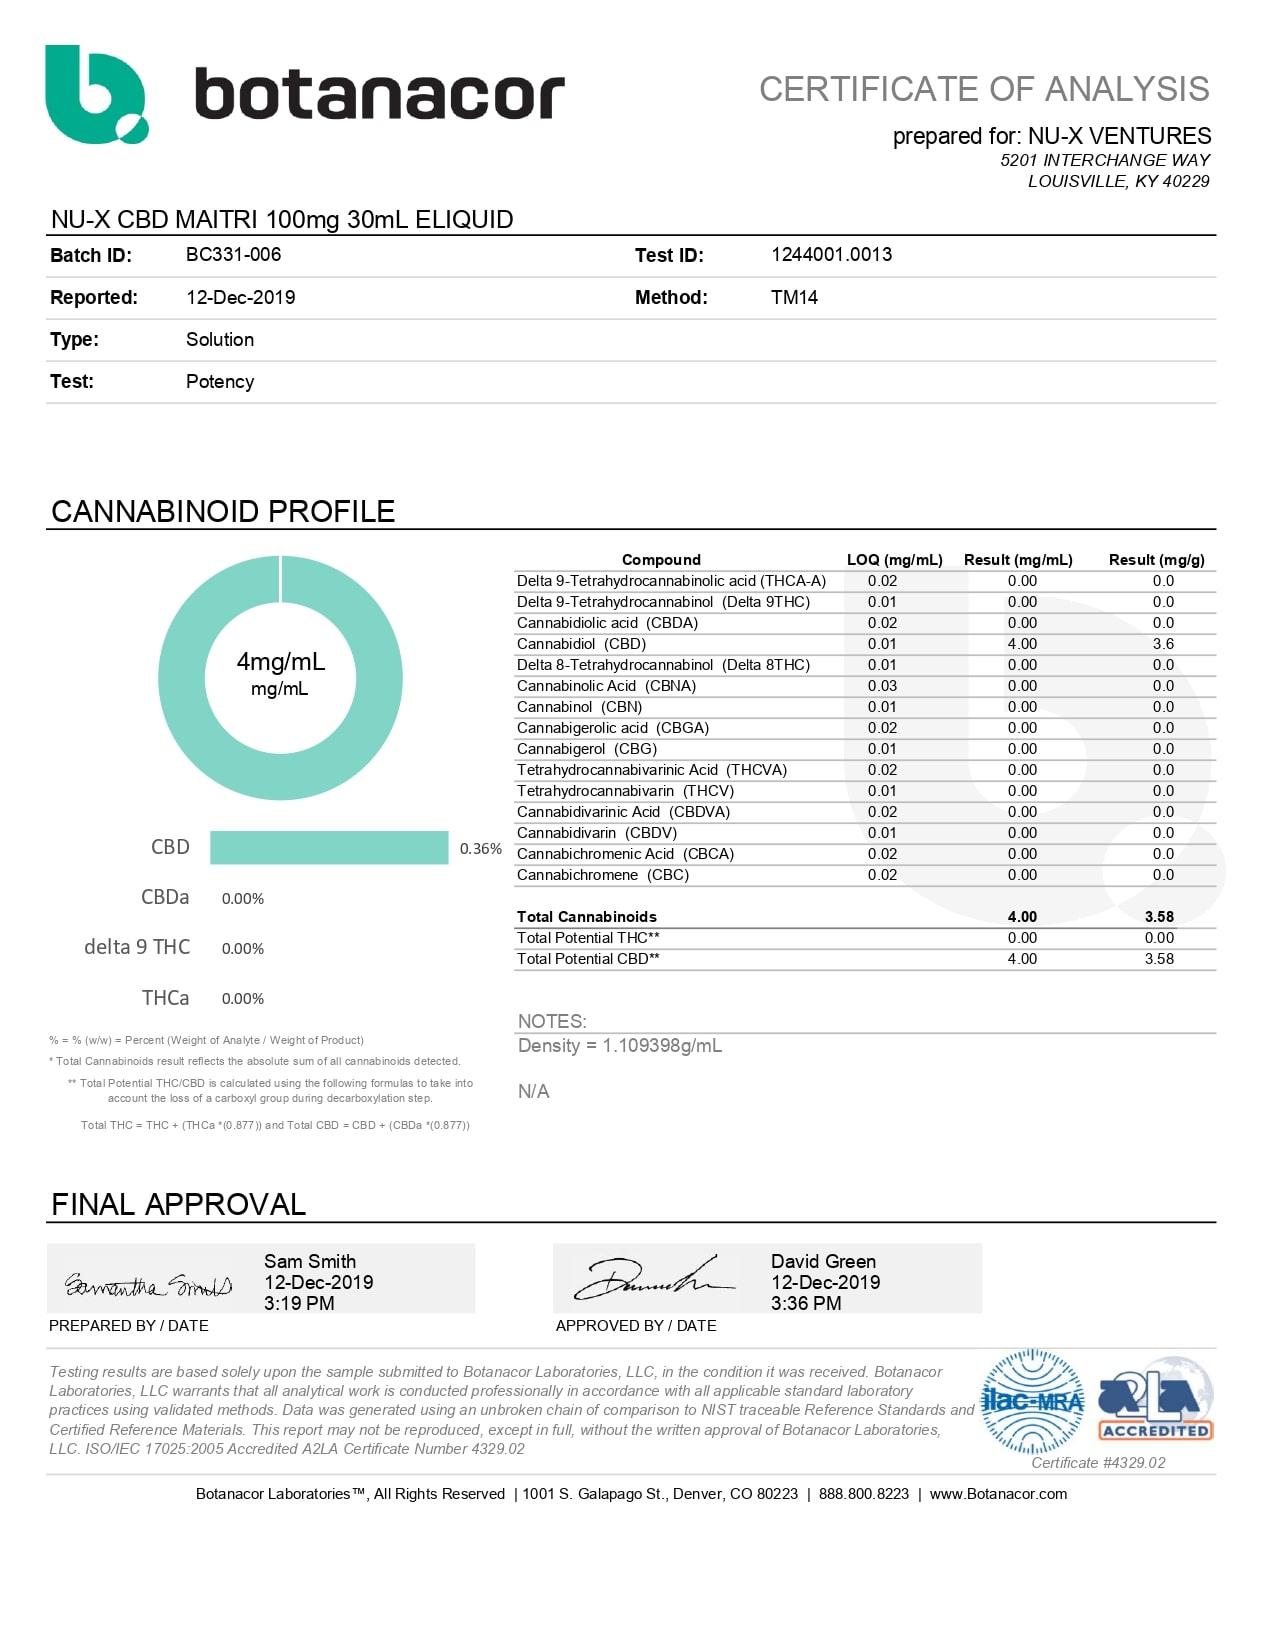 NU-X CBD eLiquid Mango Lychee - Maitri Lab Report 300mg